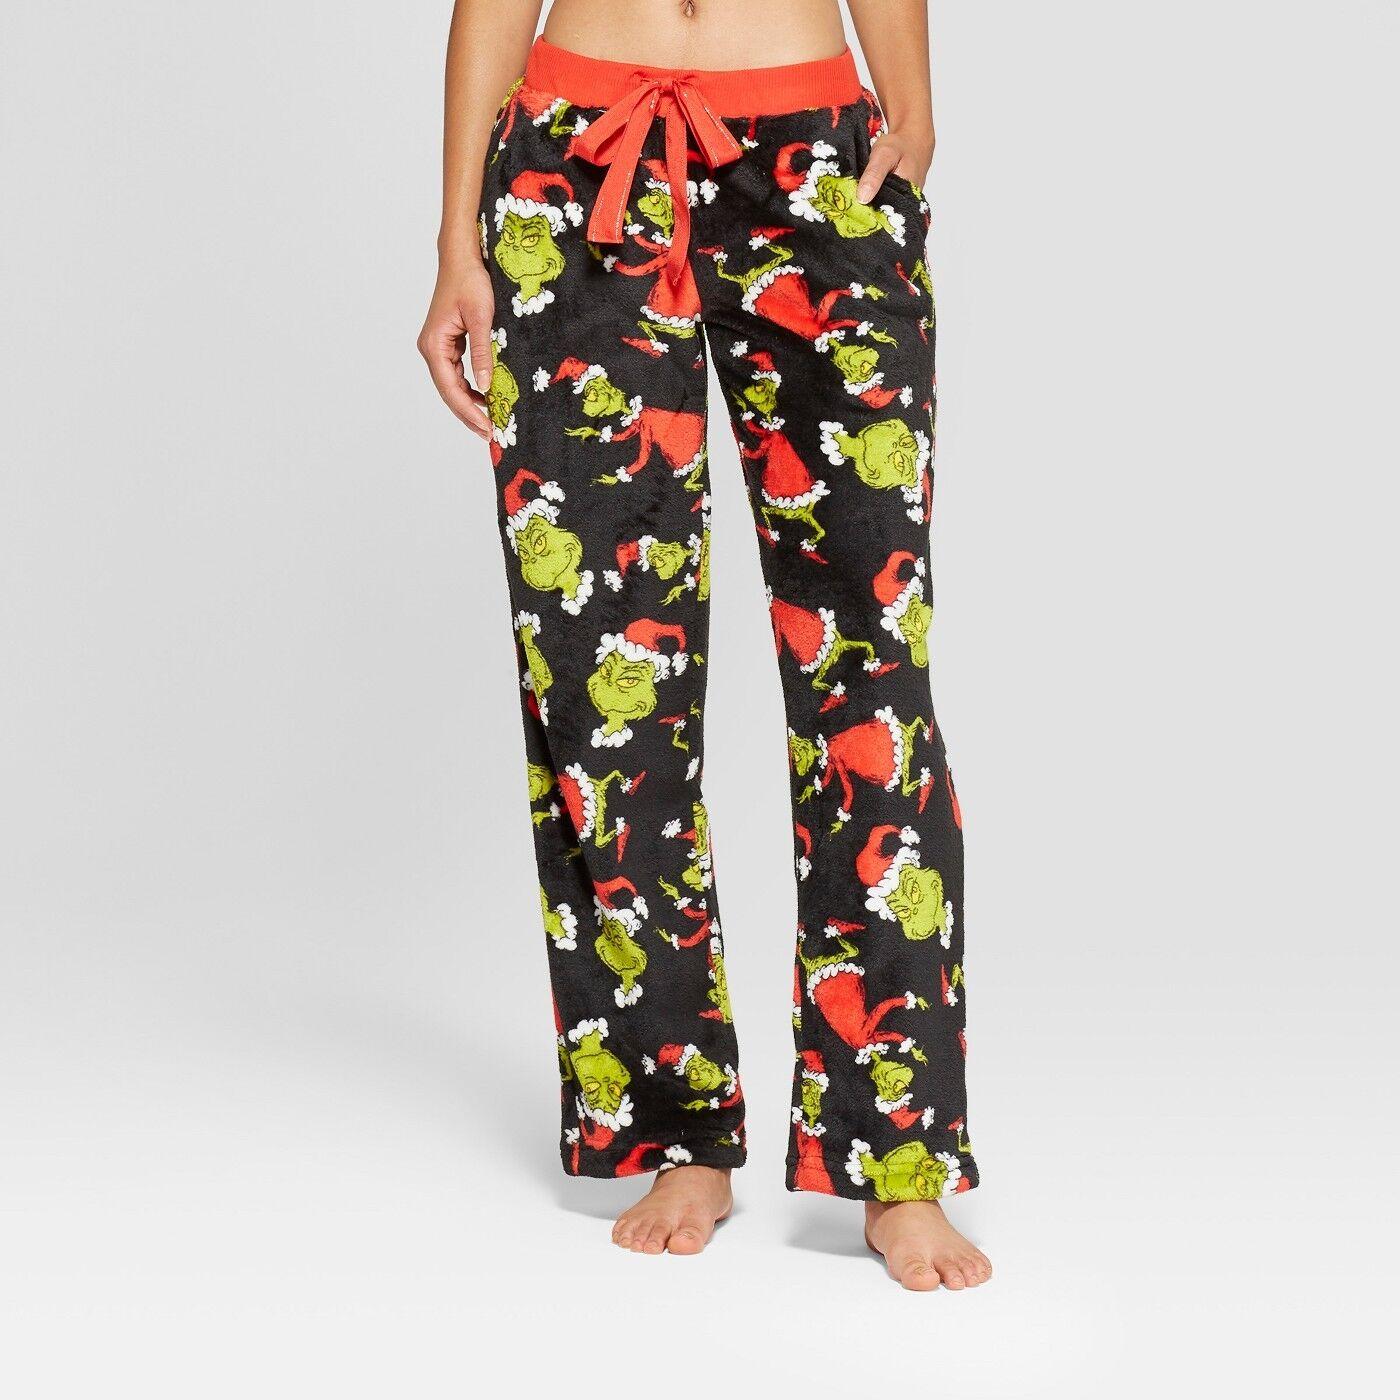 Dr Seuss The Grinch Mens Green Plaid Microfleece Sleep Pants Pajama Bottoms